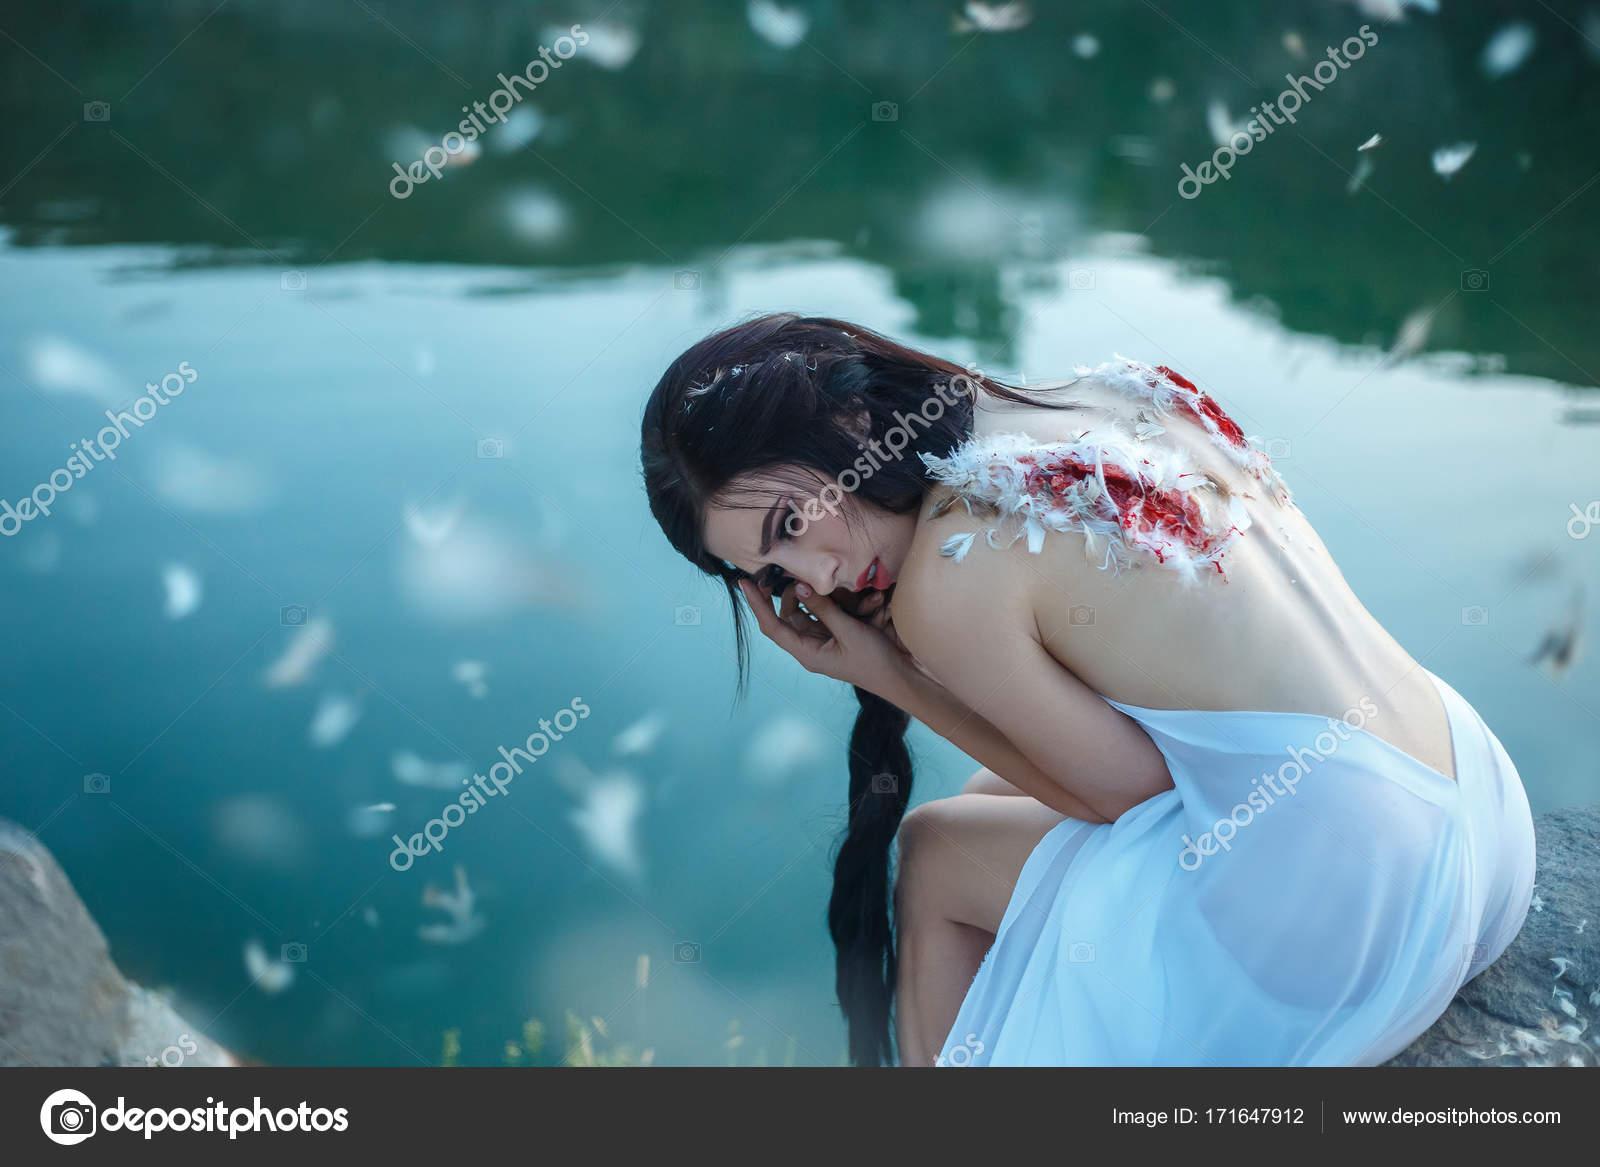 depositphotos_171647912-stock-photo-fallen-angel-a-girl-with.jpg